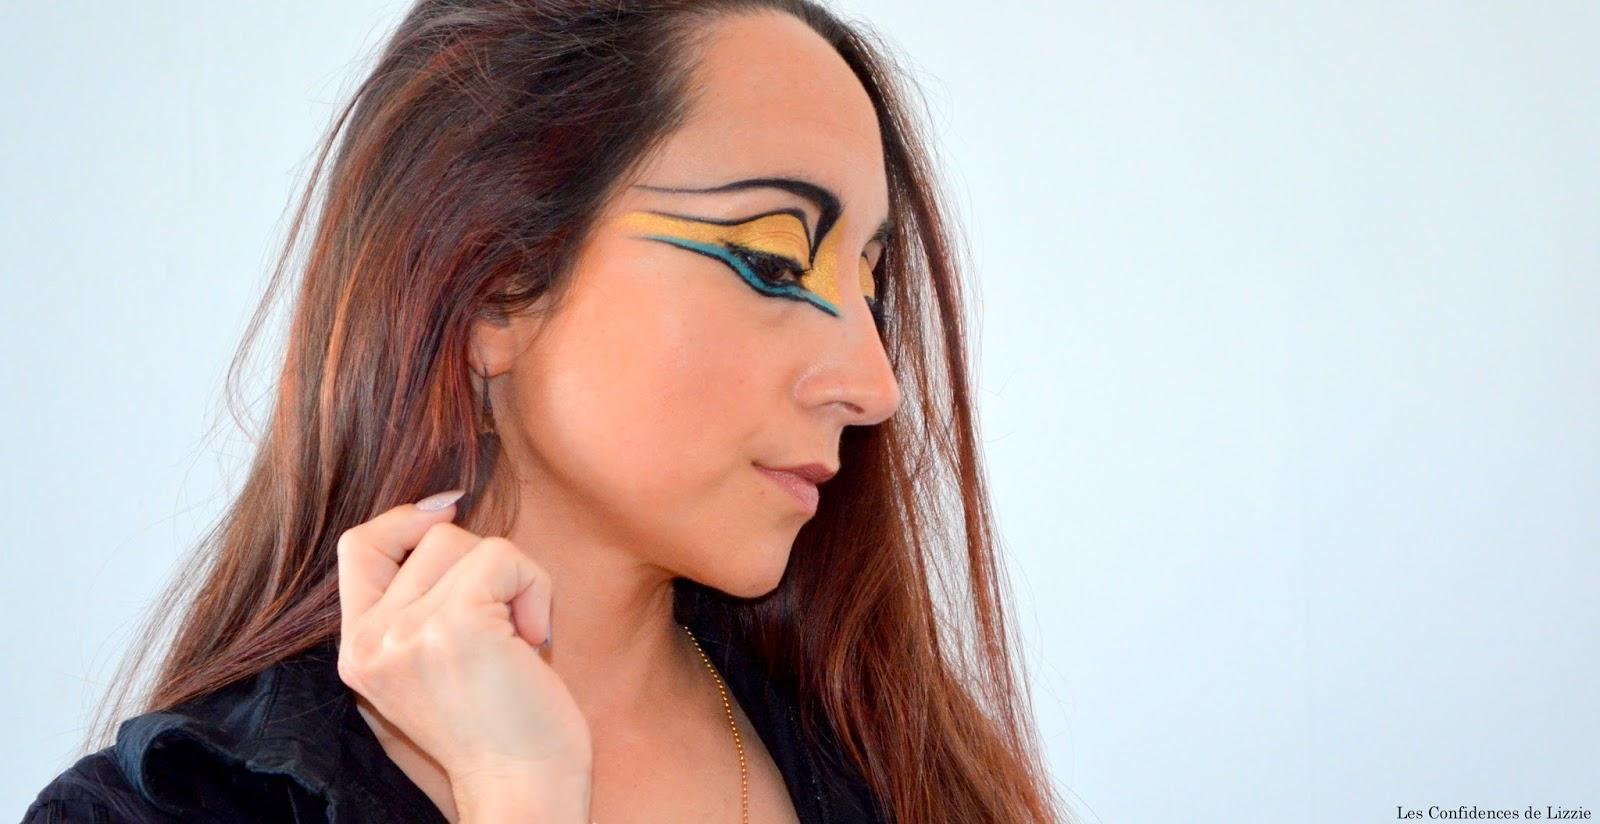 maquillage creatif - maquillage adulte disney - disney - maquillage indienne - maquillage indienne d'amerique